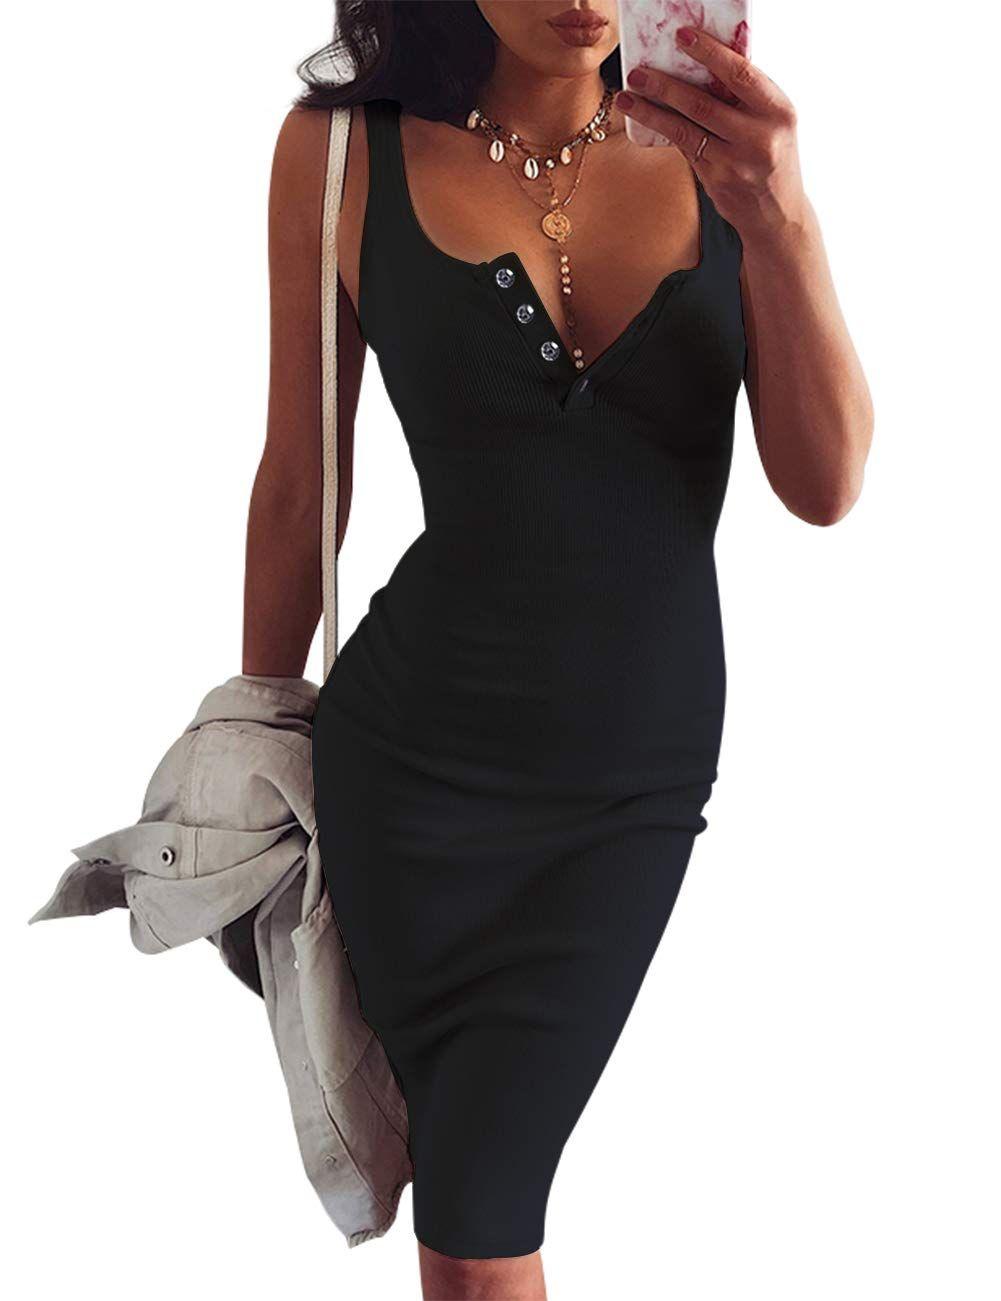 Faimilory Knitted Stretch Bodycon Buttonblack Midi Tank Dress Bodycon Casual Summer Bodycon Dress [ 1301 x 1001 Pixel ]